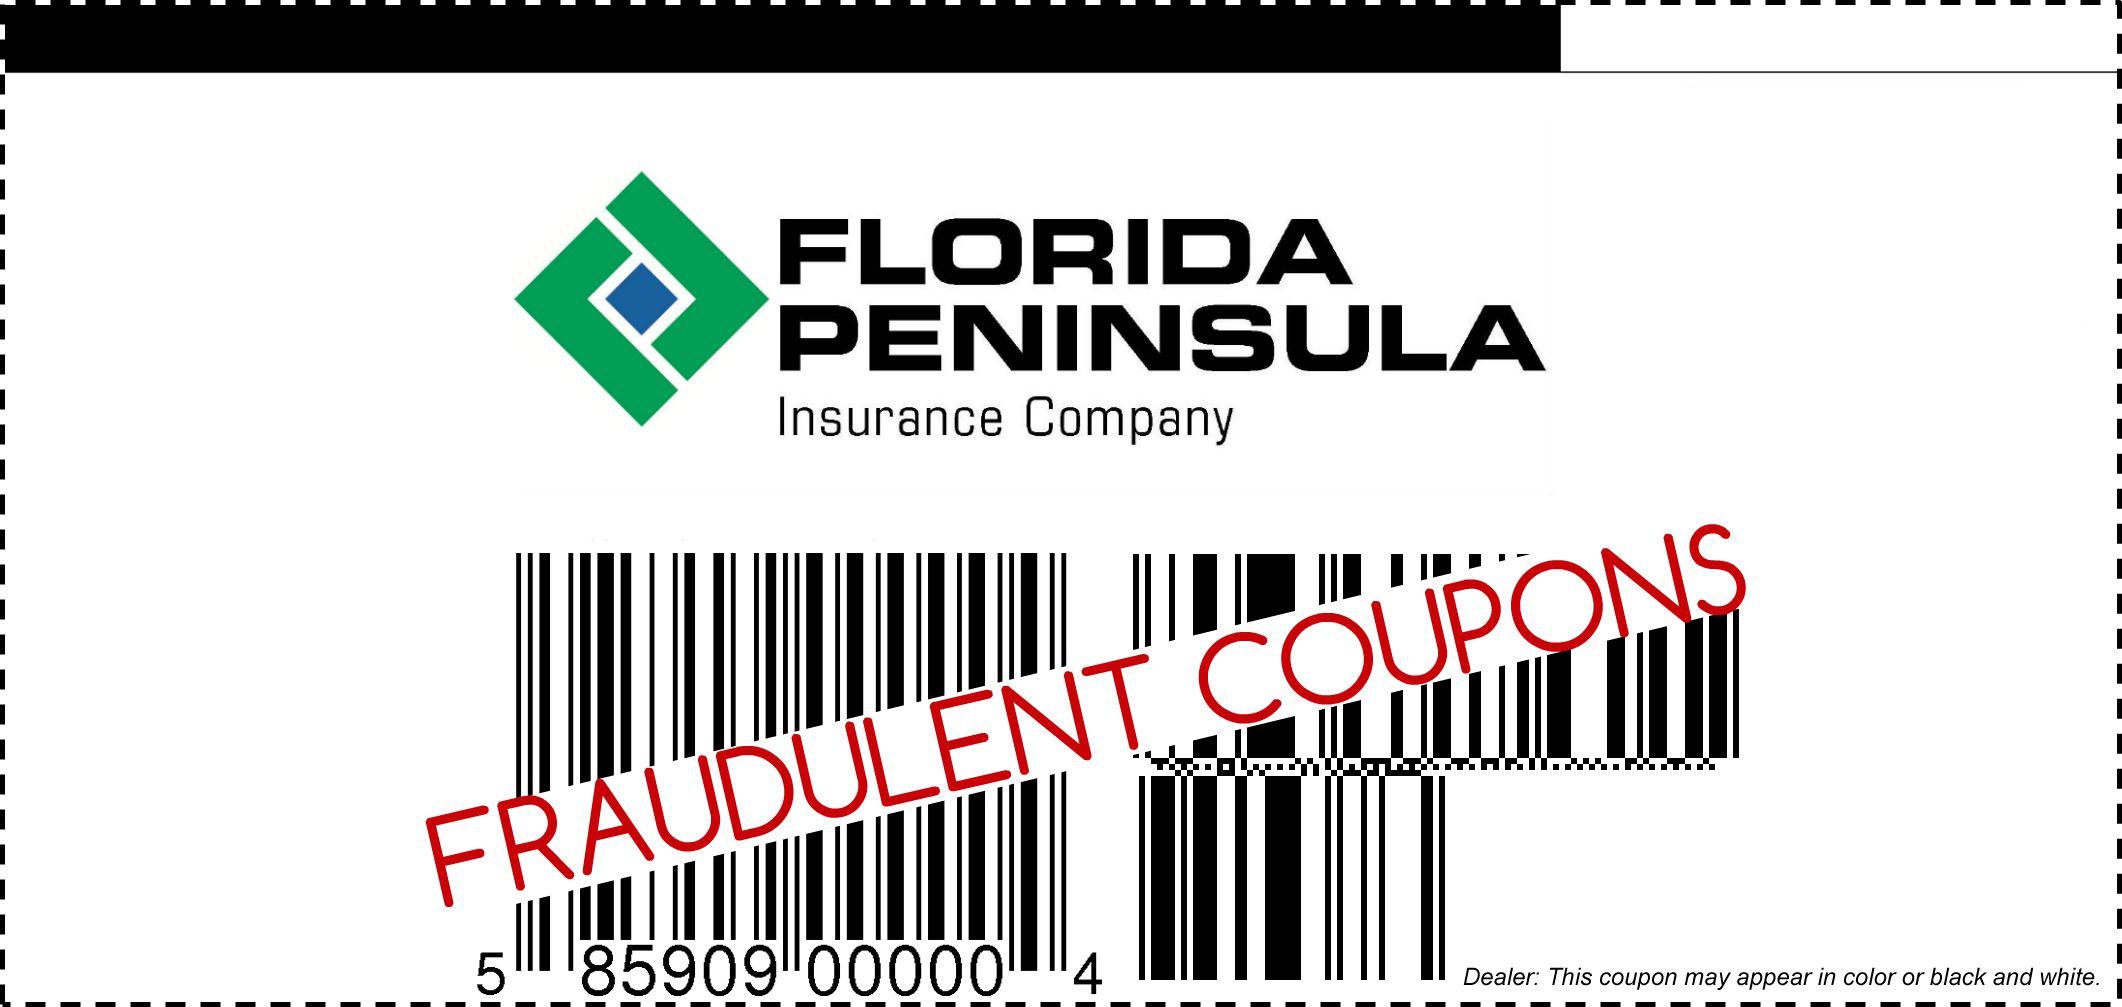 Florida Peninsula Blog Tips for Avoiding Coupon Fraud